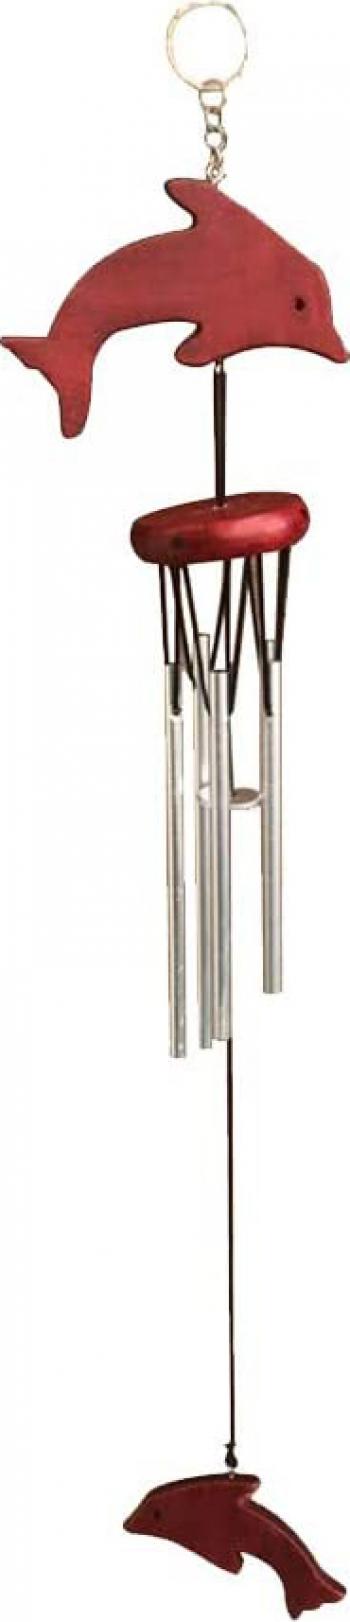 Clopotel de vant cu 6 tuburi si delfini remediu Feng Shui din Metal 690 mm lungime